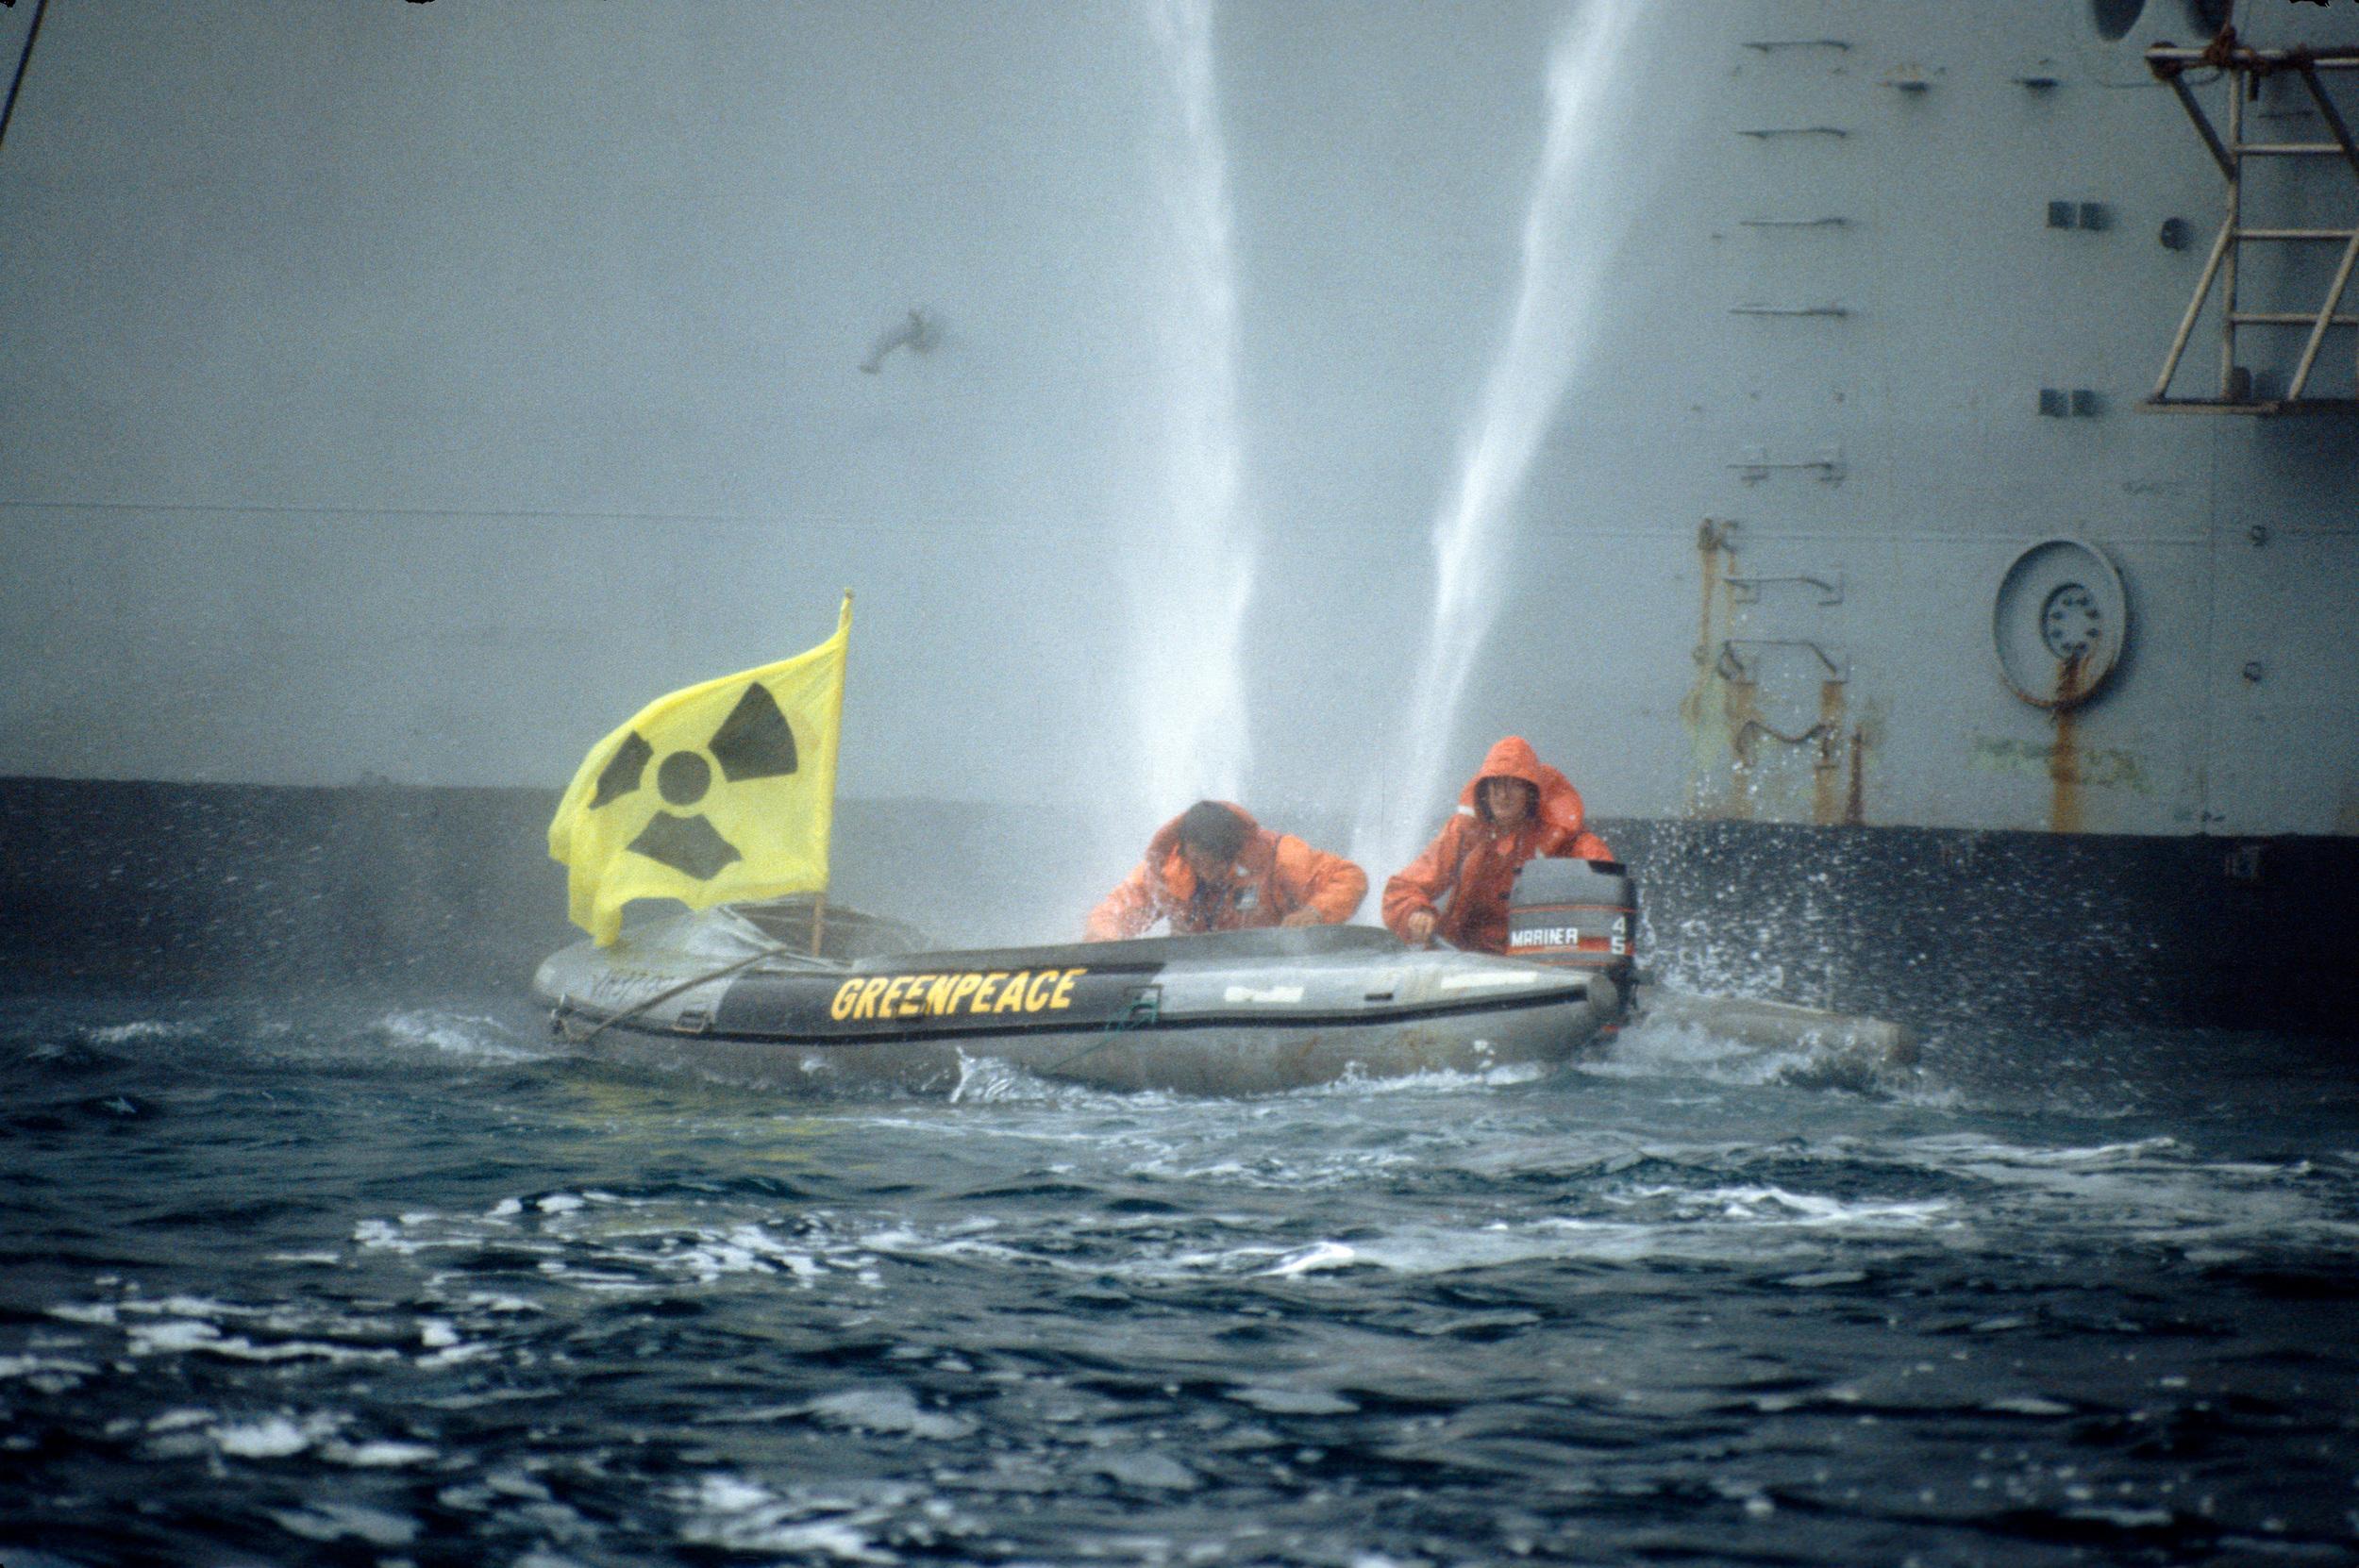 greenpeace boats